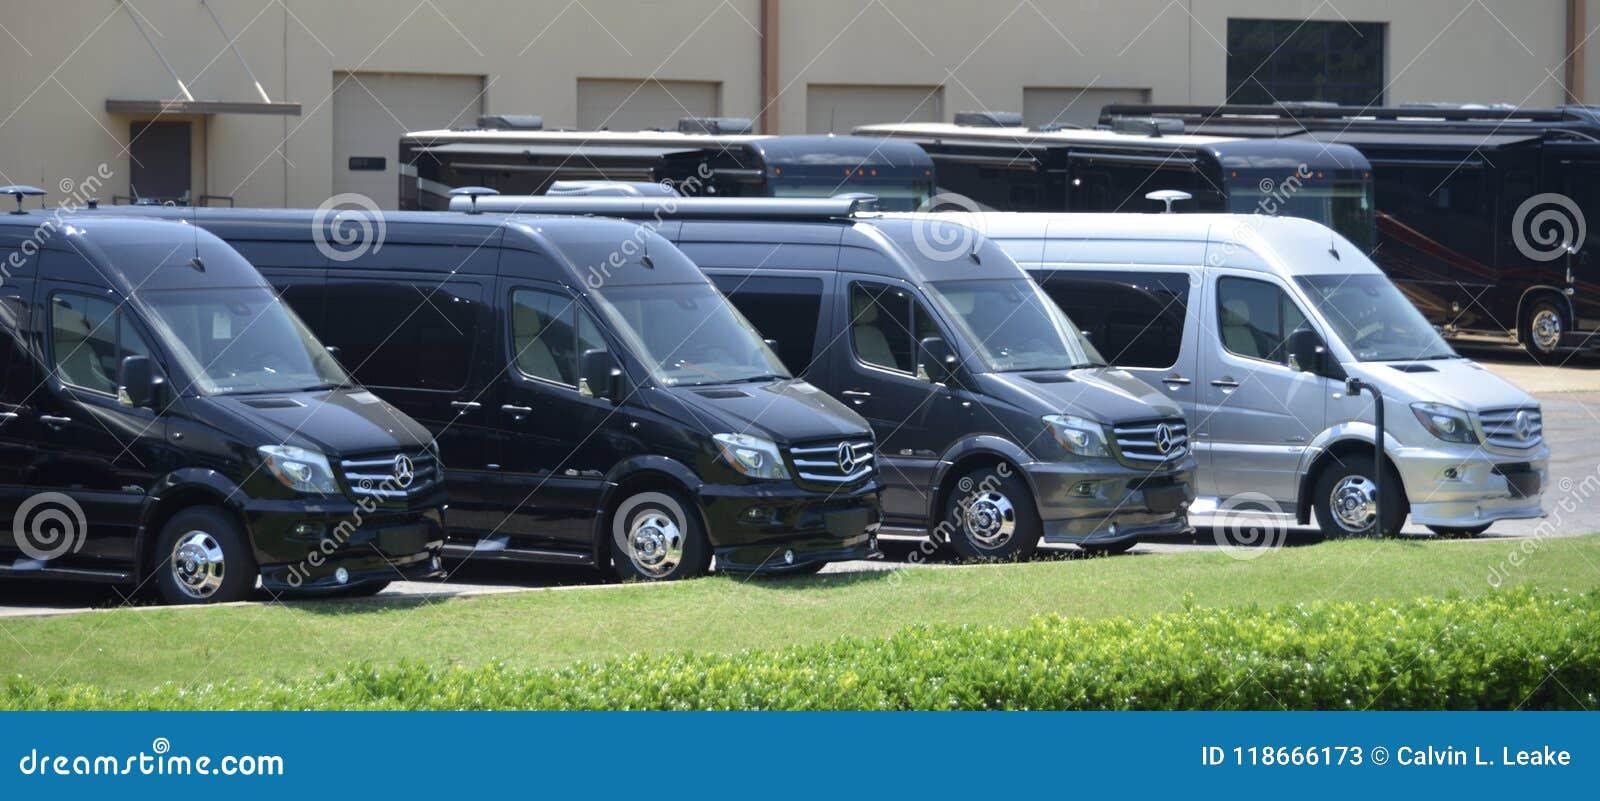 Mercedes Sprinter Rv Campers Editorial Stock Photo Image Of Benz Camper Download Campsites Delivers 118666173